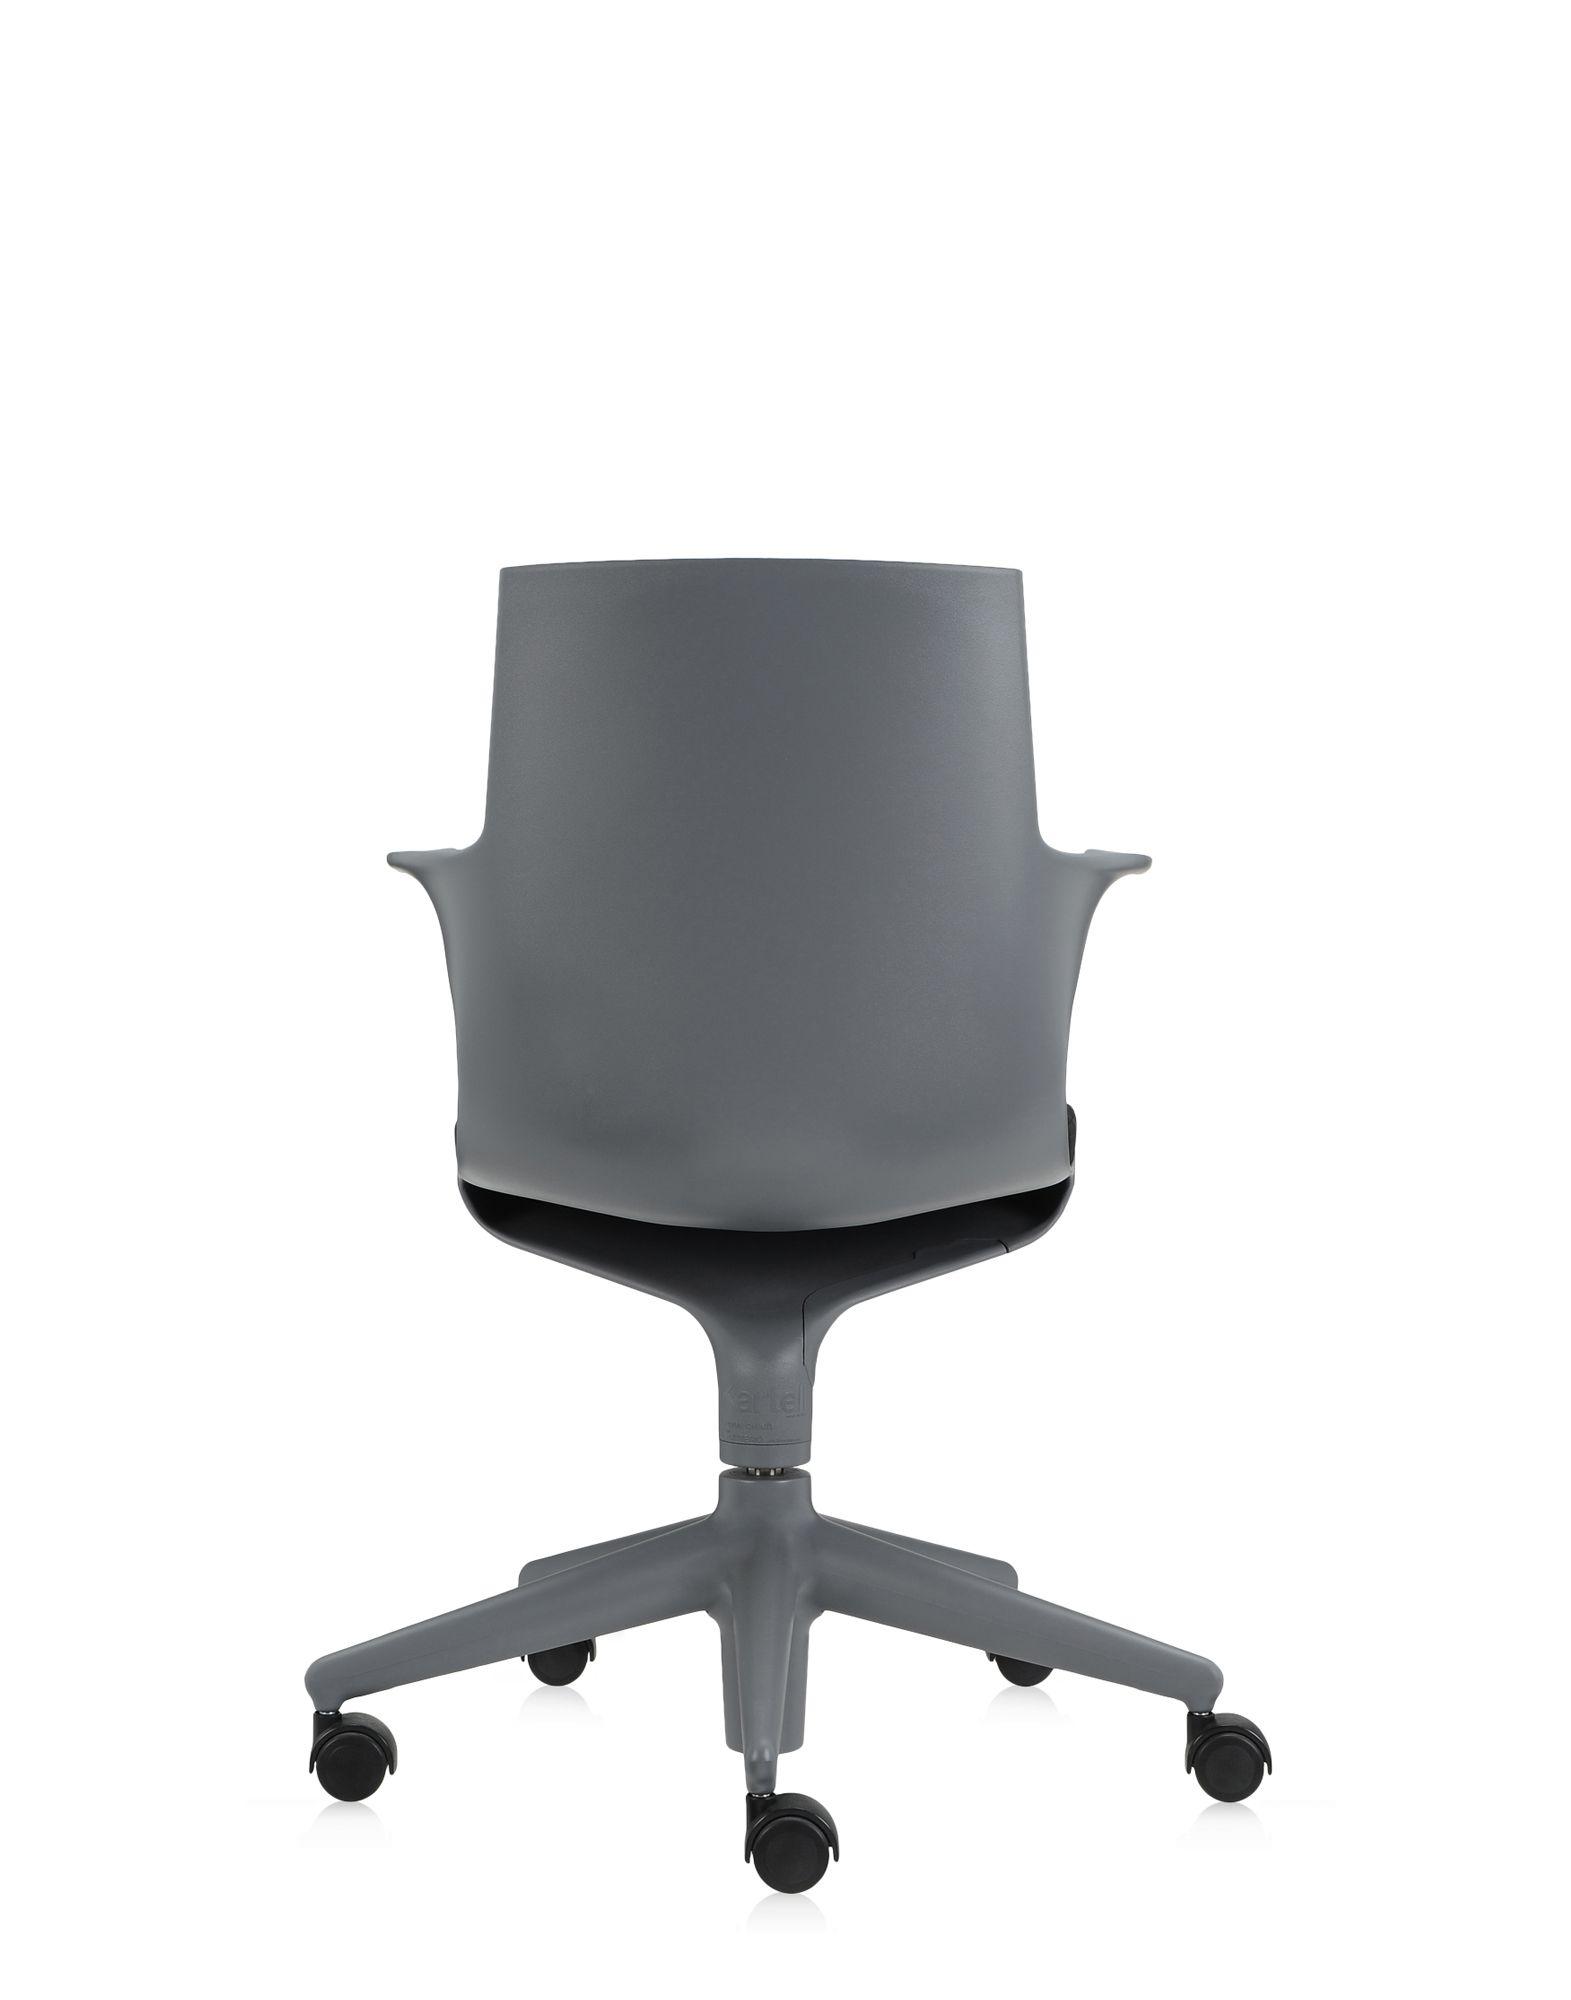 Kartell office chair spoon chair grey black